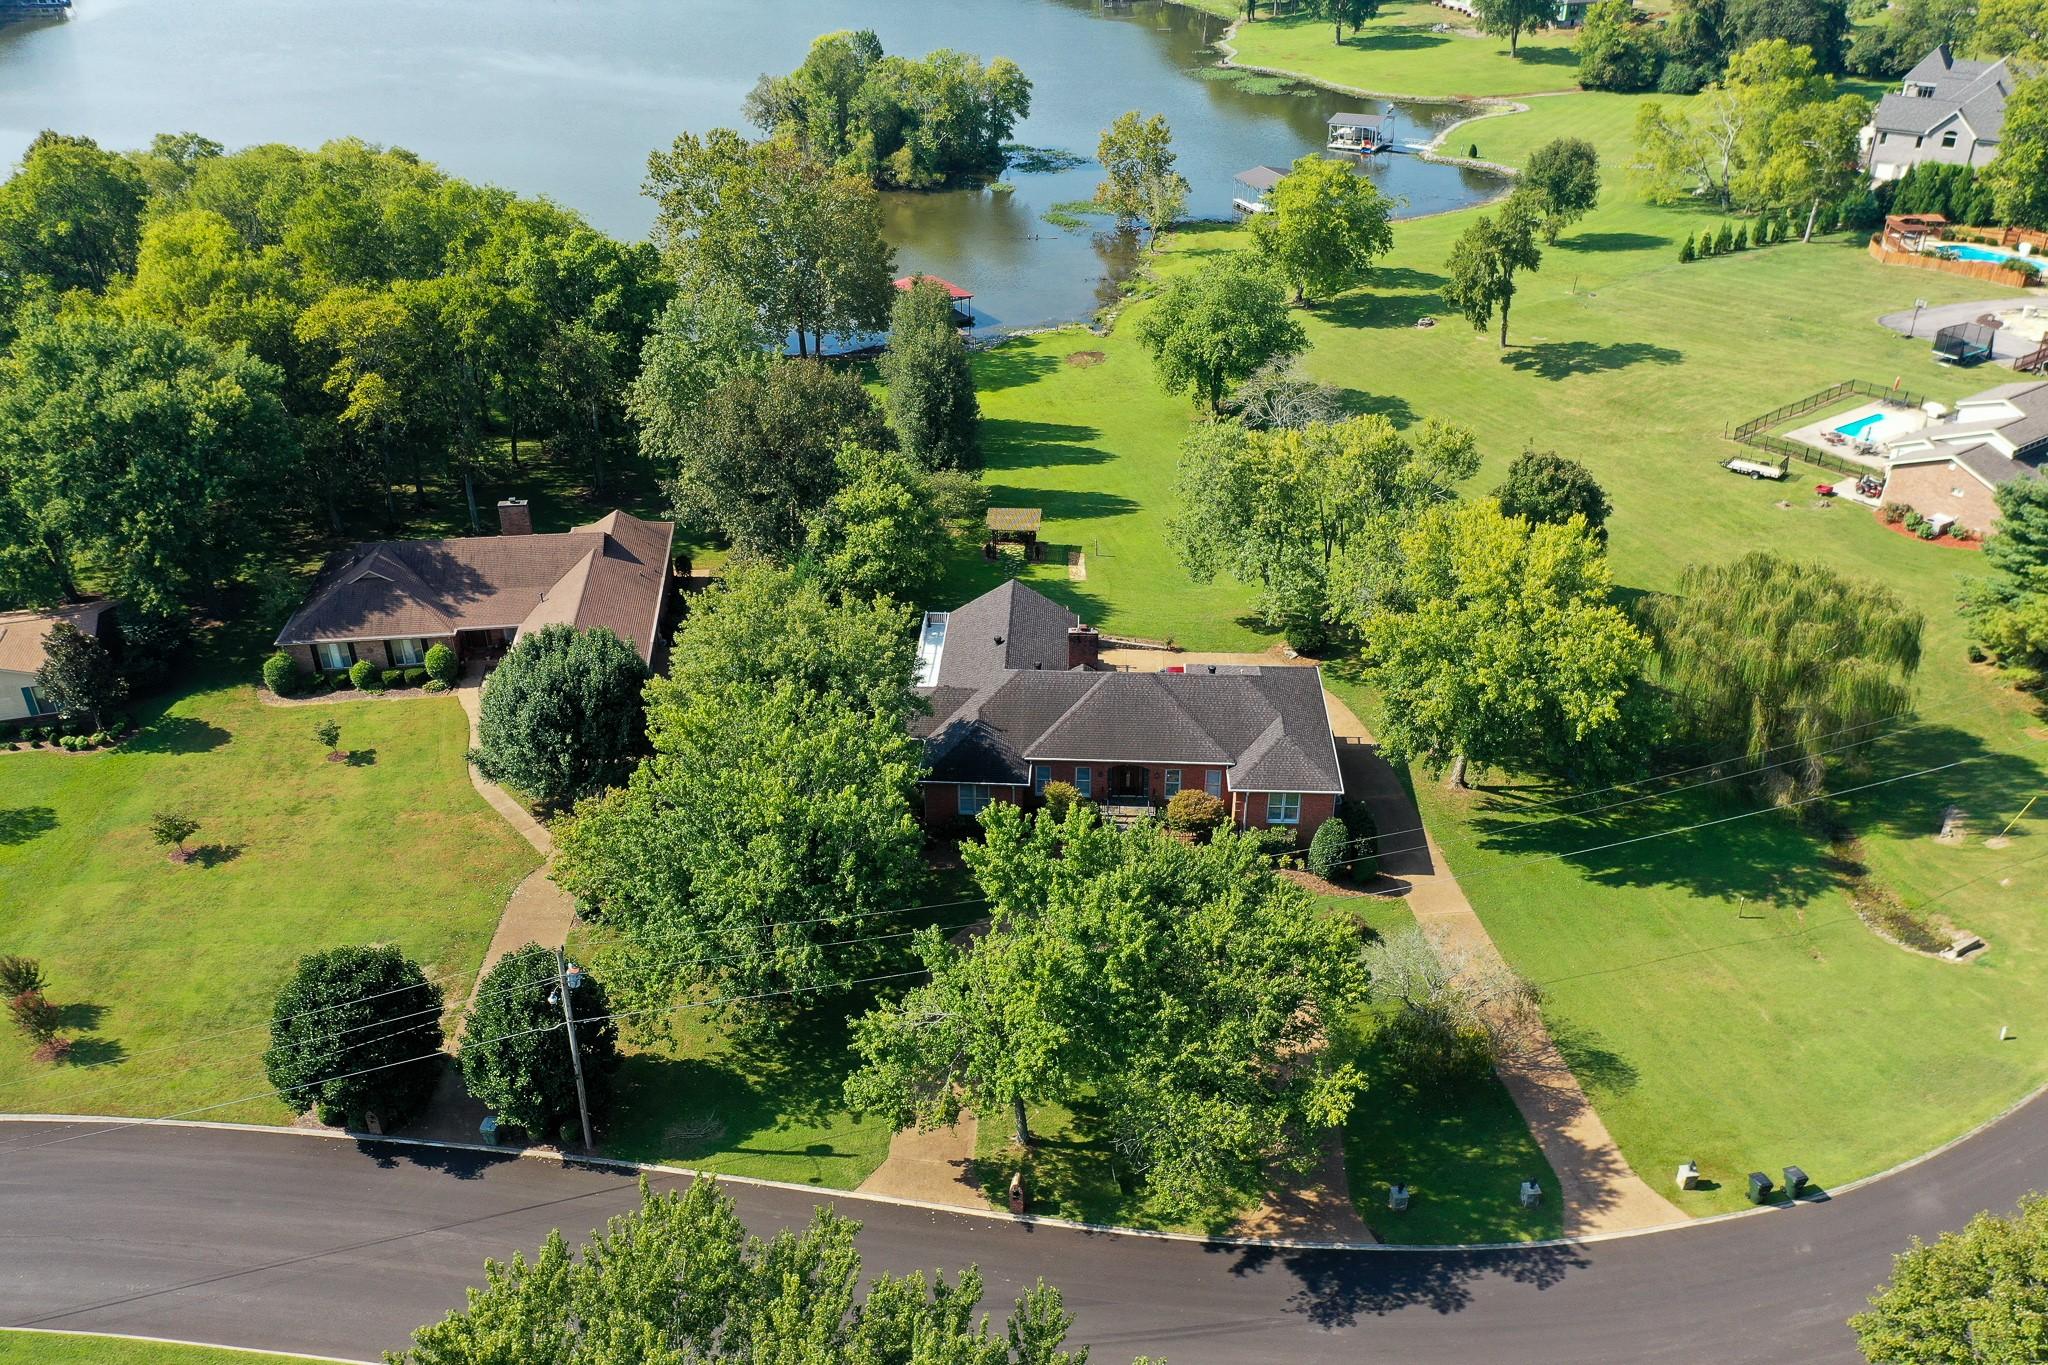 633 Bay Point Dr, Gallatin, TN 37066 - Gallatin, TN real estate listing